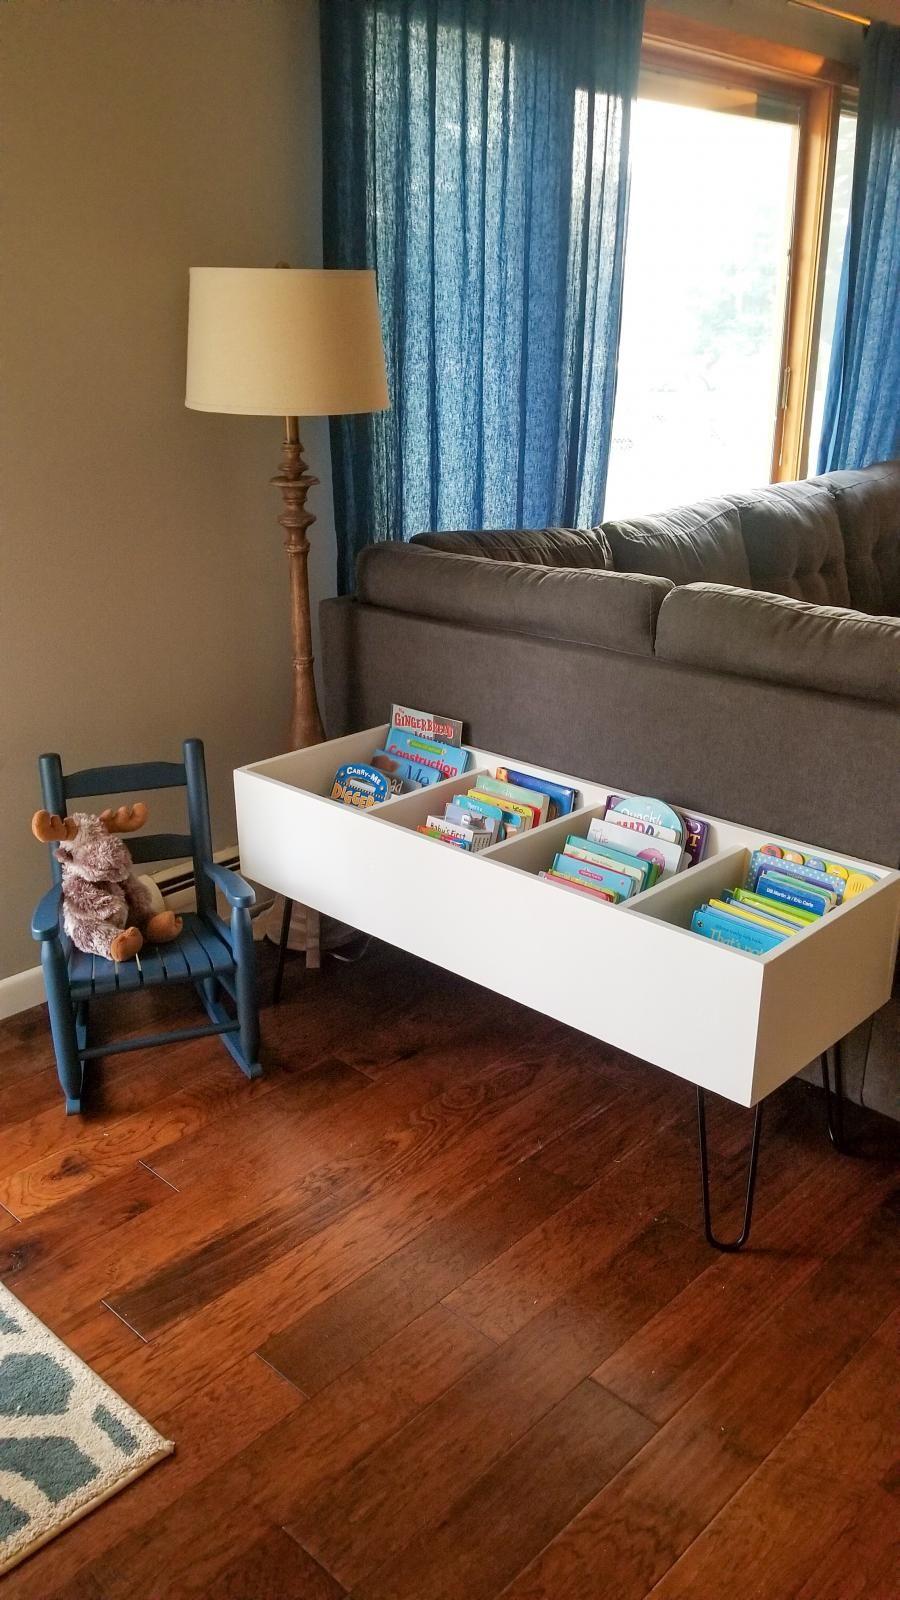 Diy Book Bin Kids Book Storage Bookshelves Kids Ikea Kids #storage #bins #for #living #room